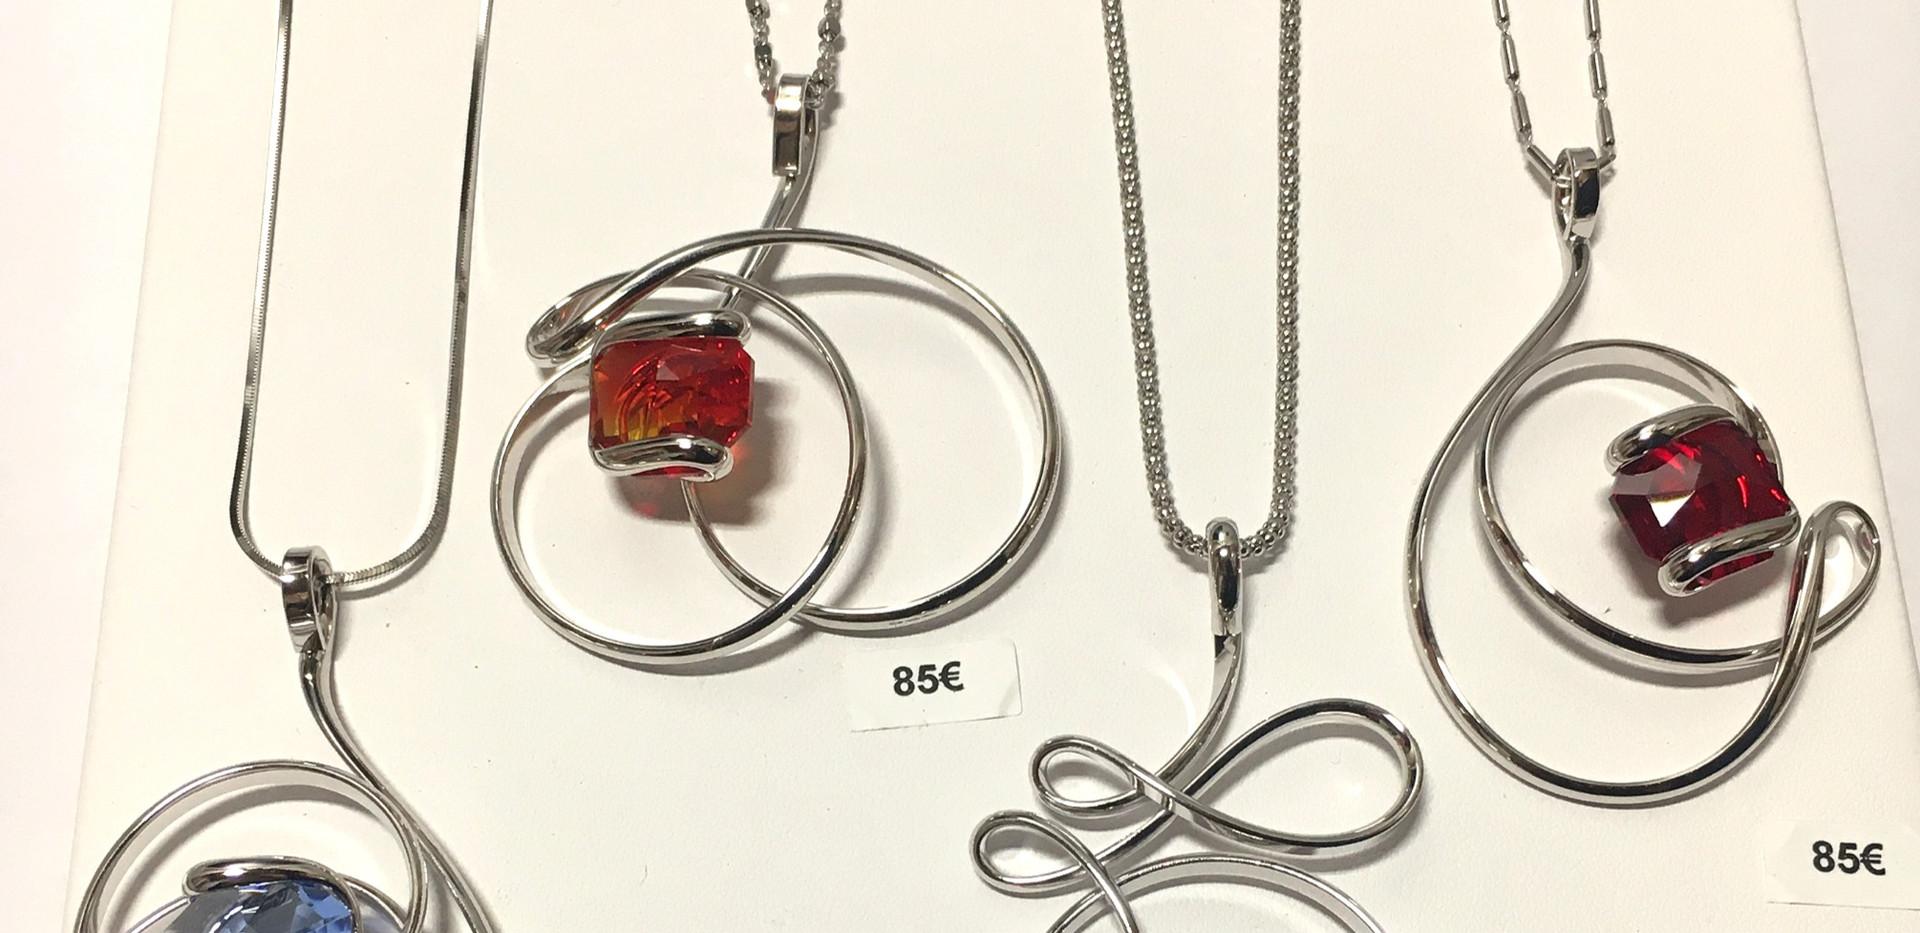 Choix collier pendentif volume entrelacé. 85€-90€